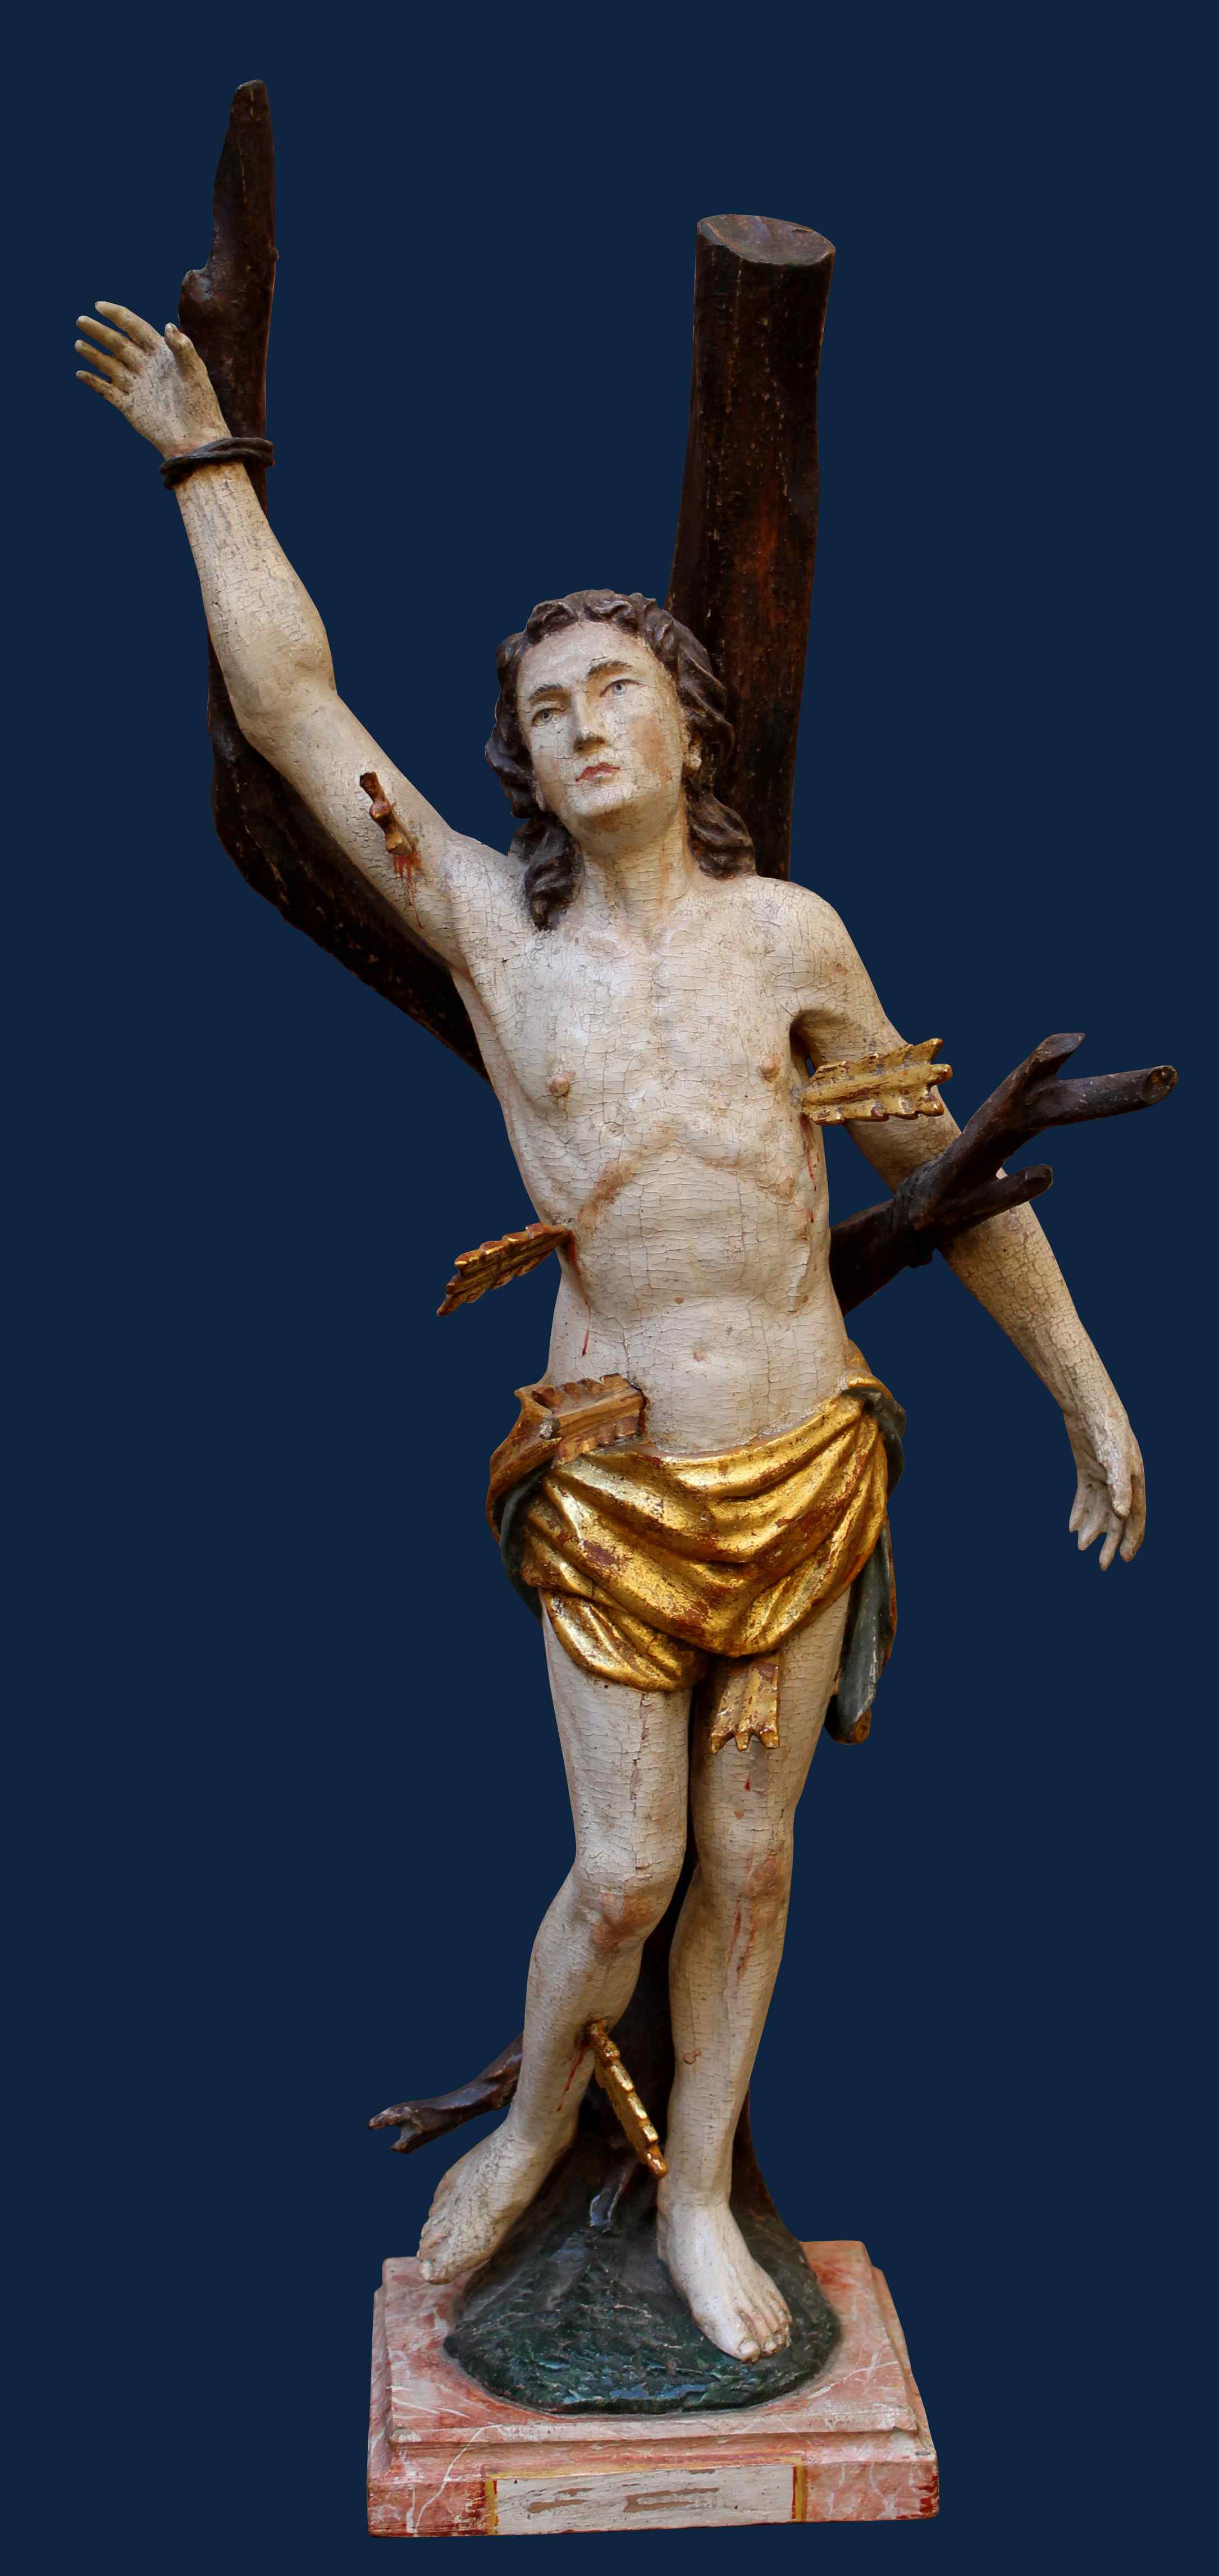 XVIII secolo, San Sebastiano, Legno policromo, alt. cm 55